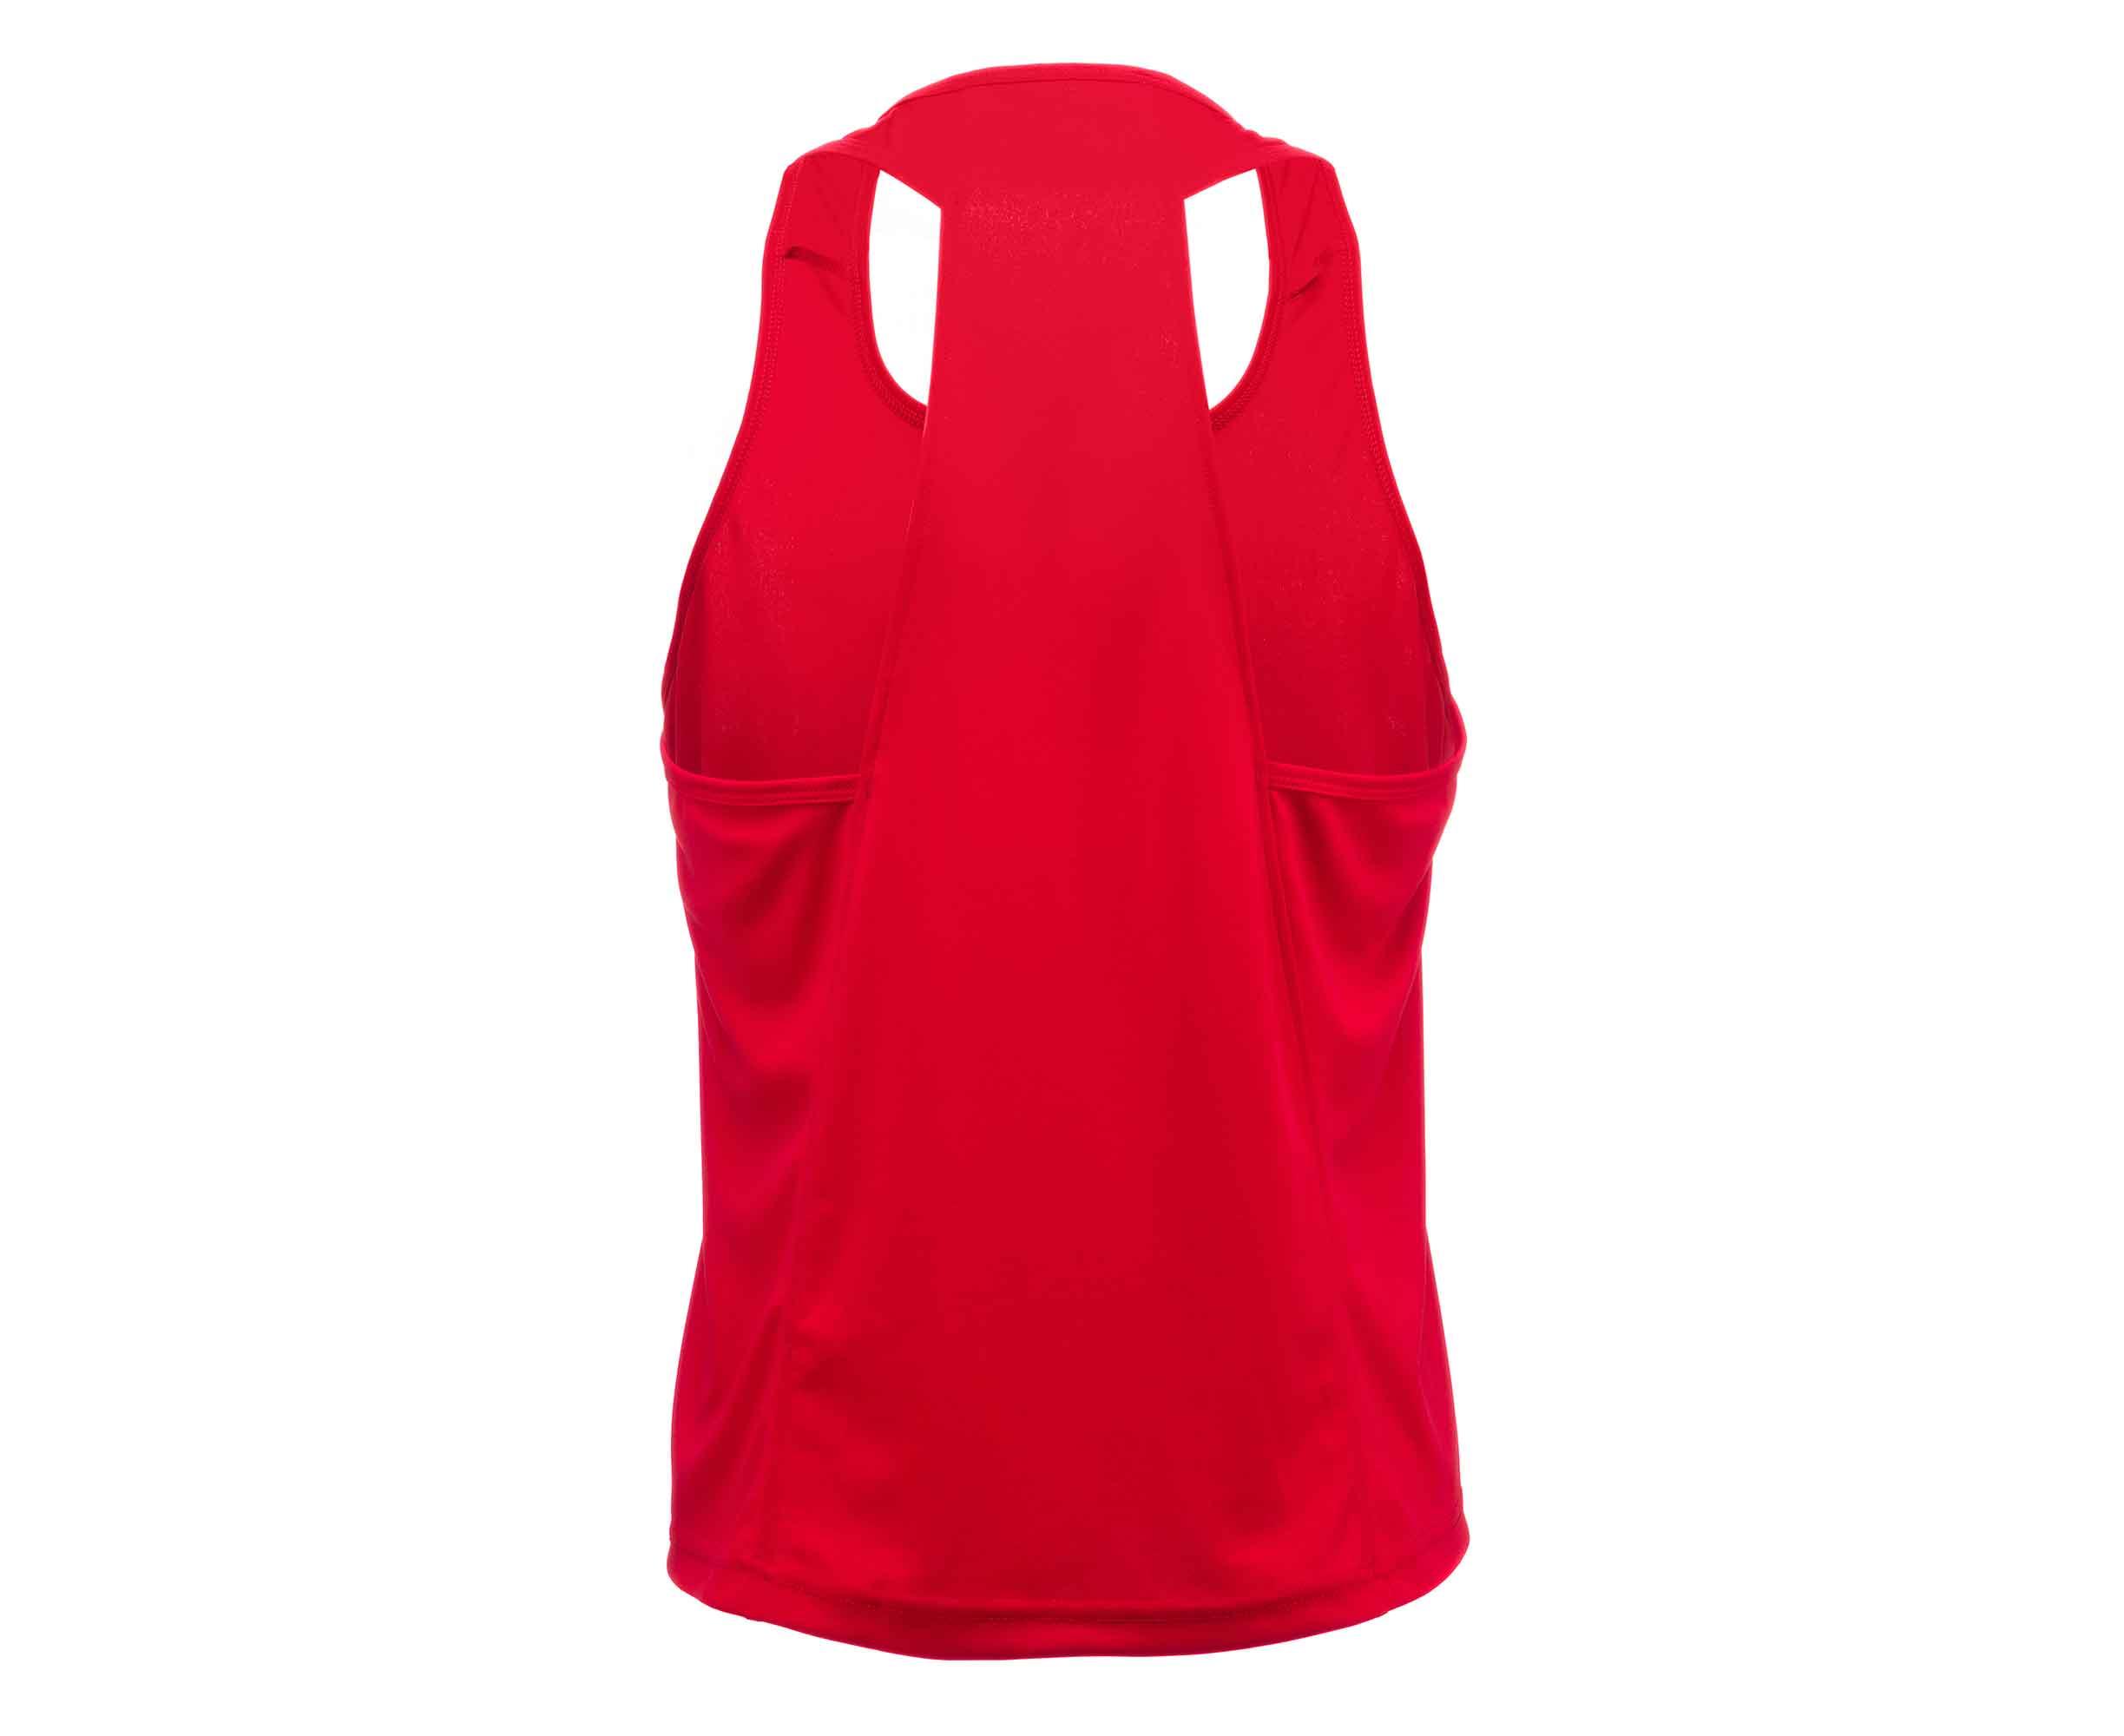 Майка боксерская Adidas Clinch Olimp красная 140